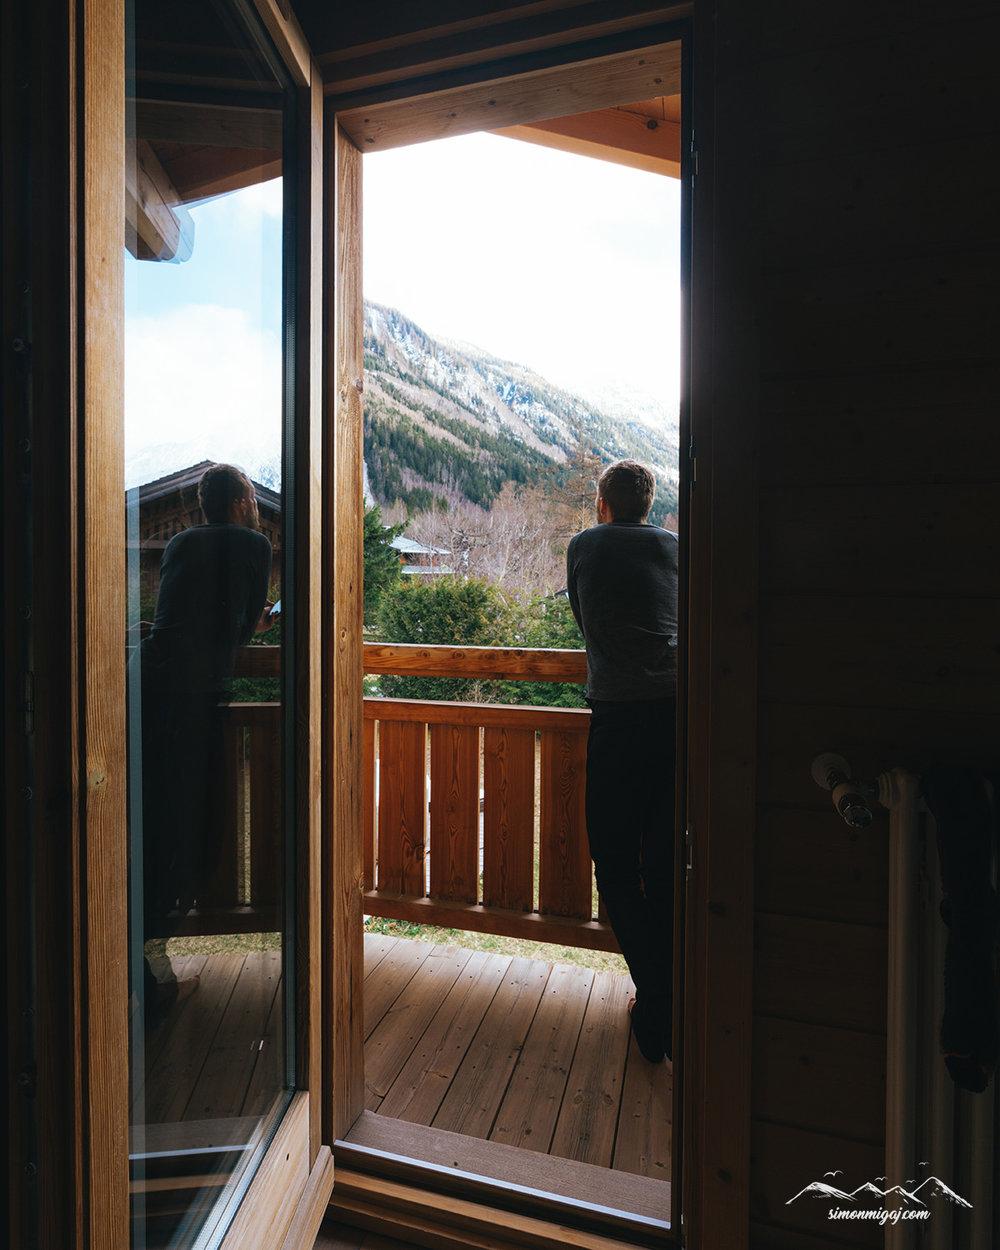 Deuter-Admiring-views-chamonix.jpg